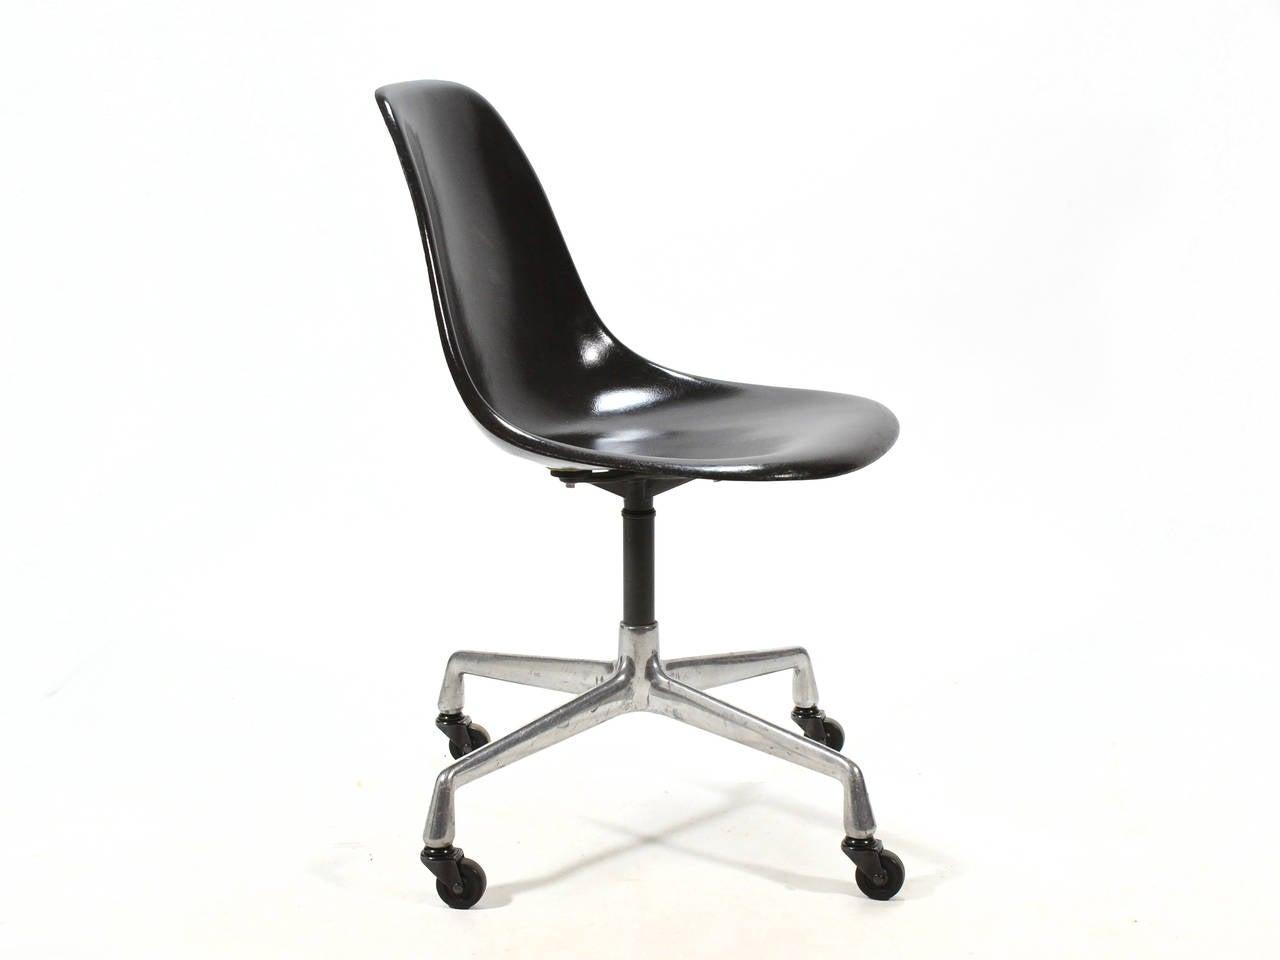 eames psc fiberglass side chairs by herman miller set of. Black Bedroom Furniture Sets. Home Design Ideas